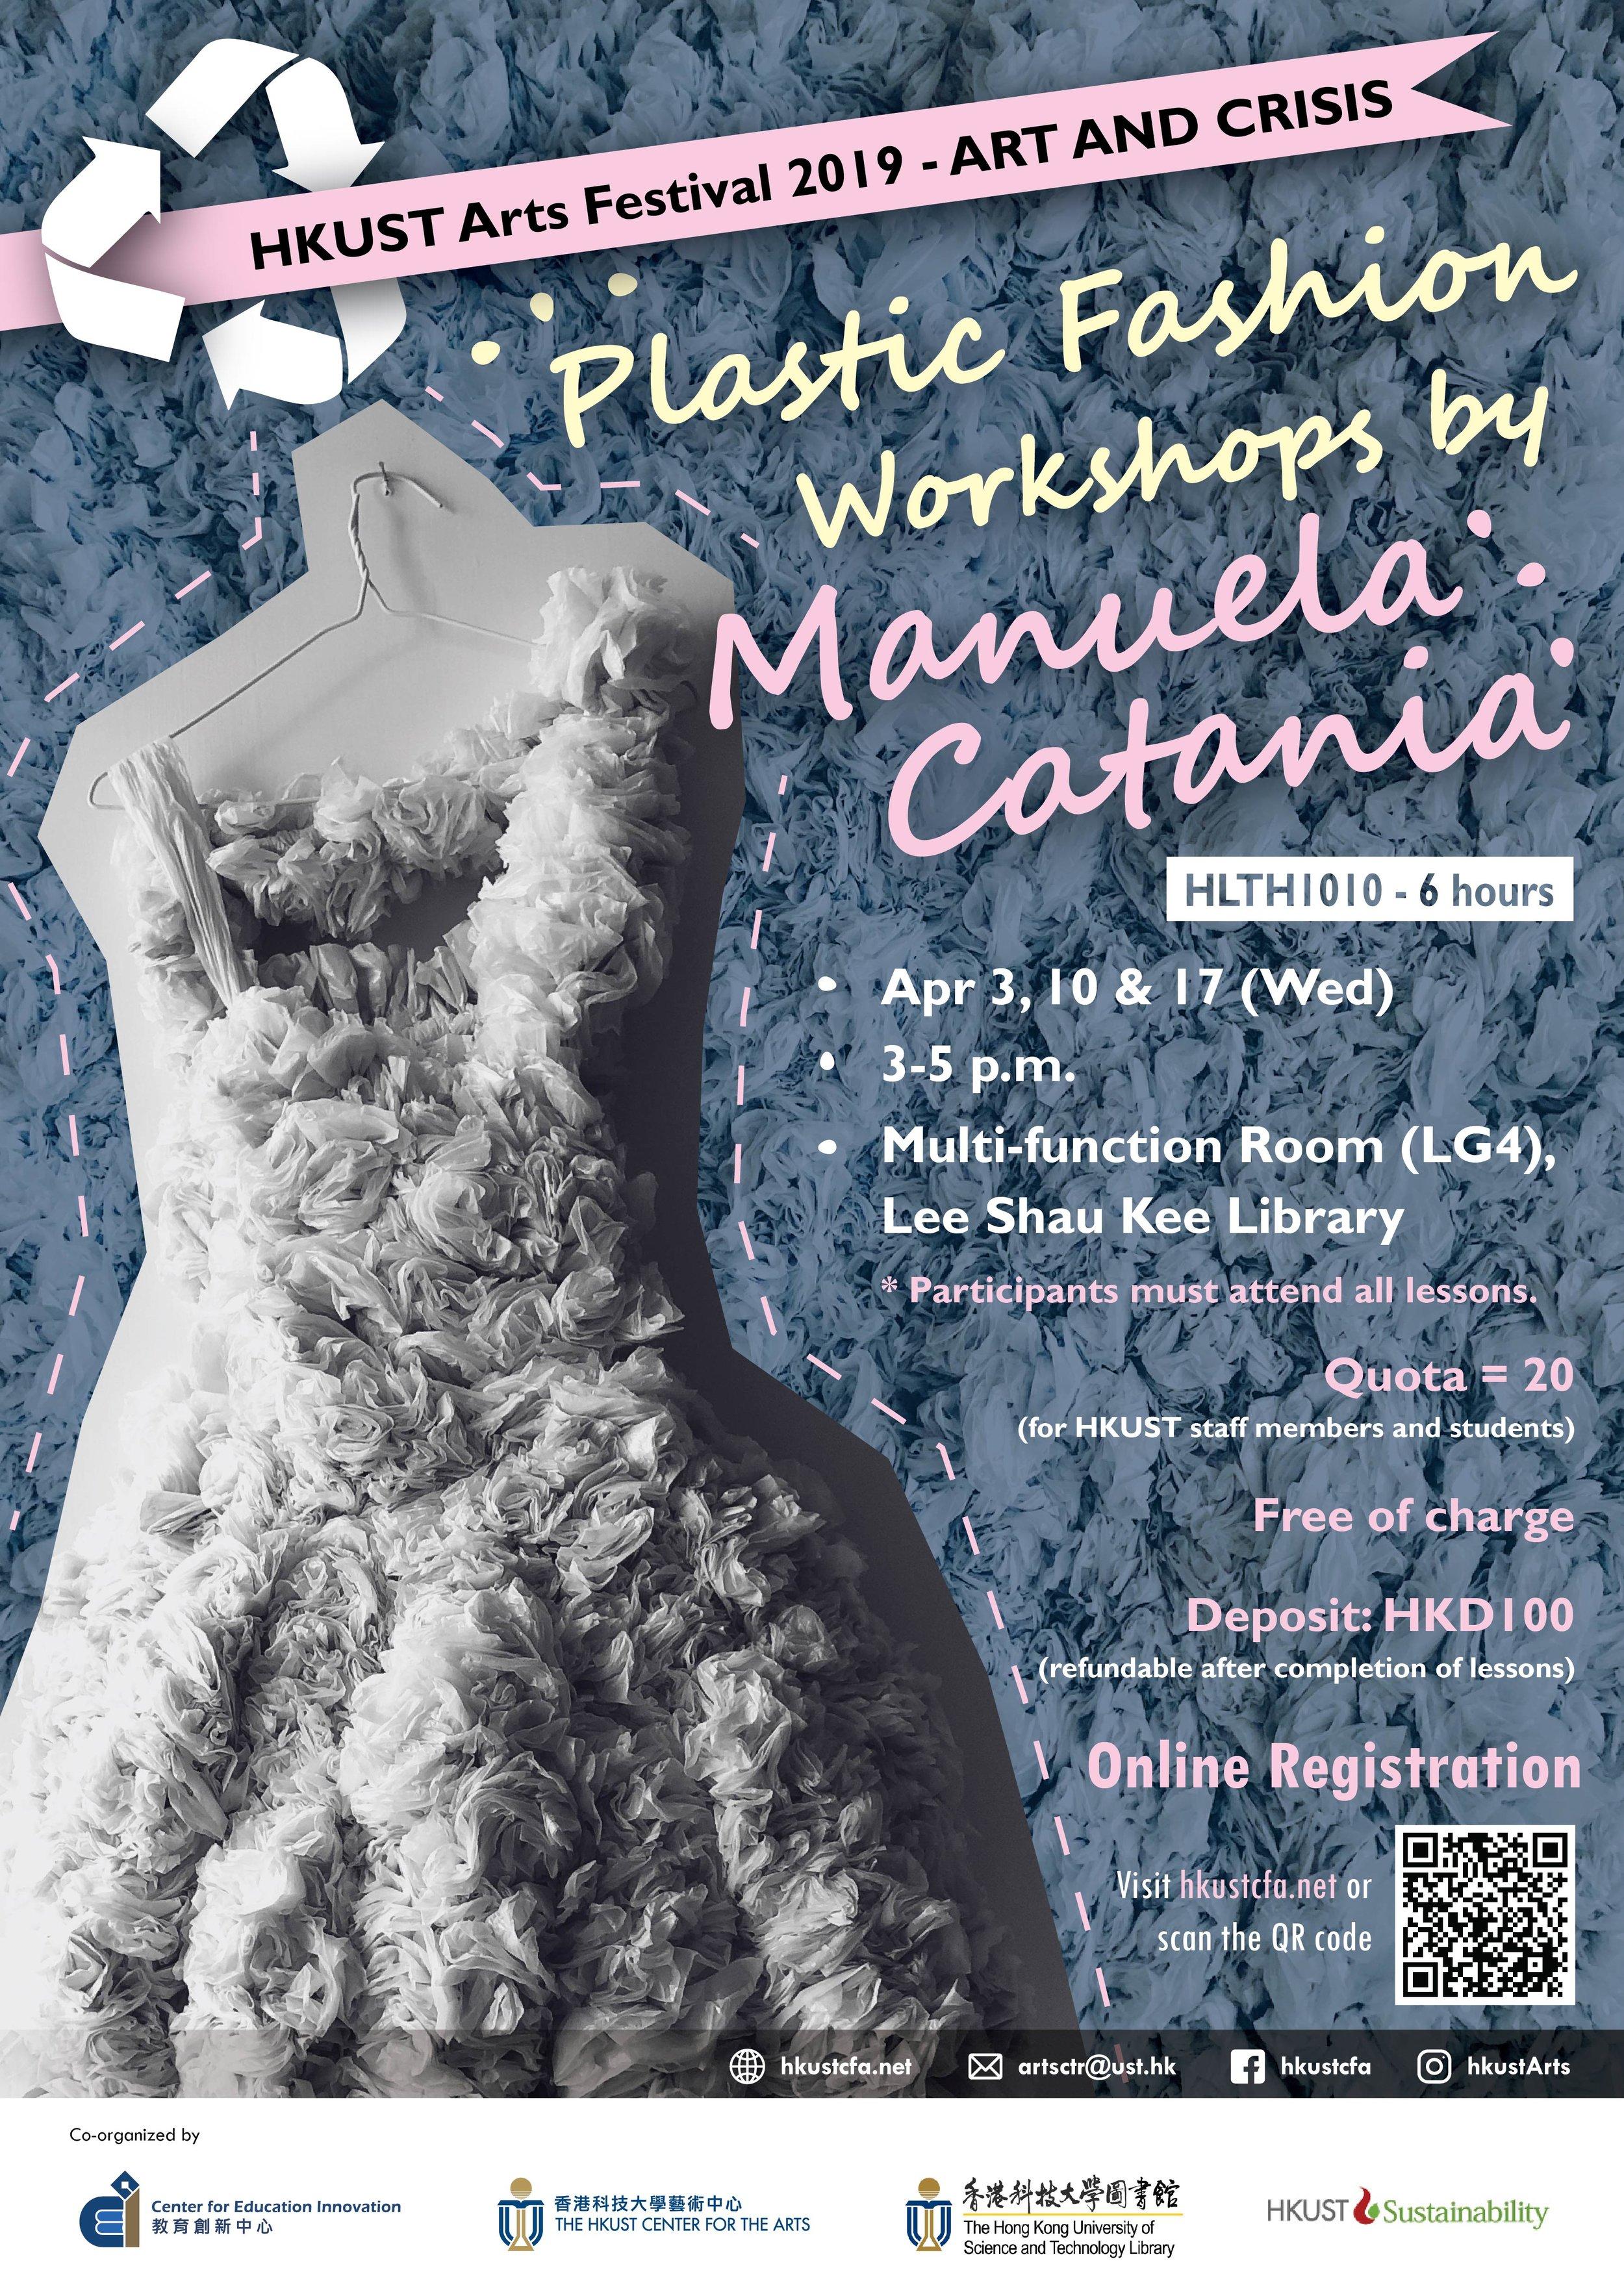 Poster_Plastic Fashion Workshop_20190403_10_17-01.jpg